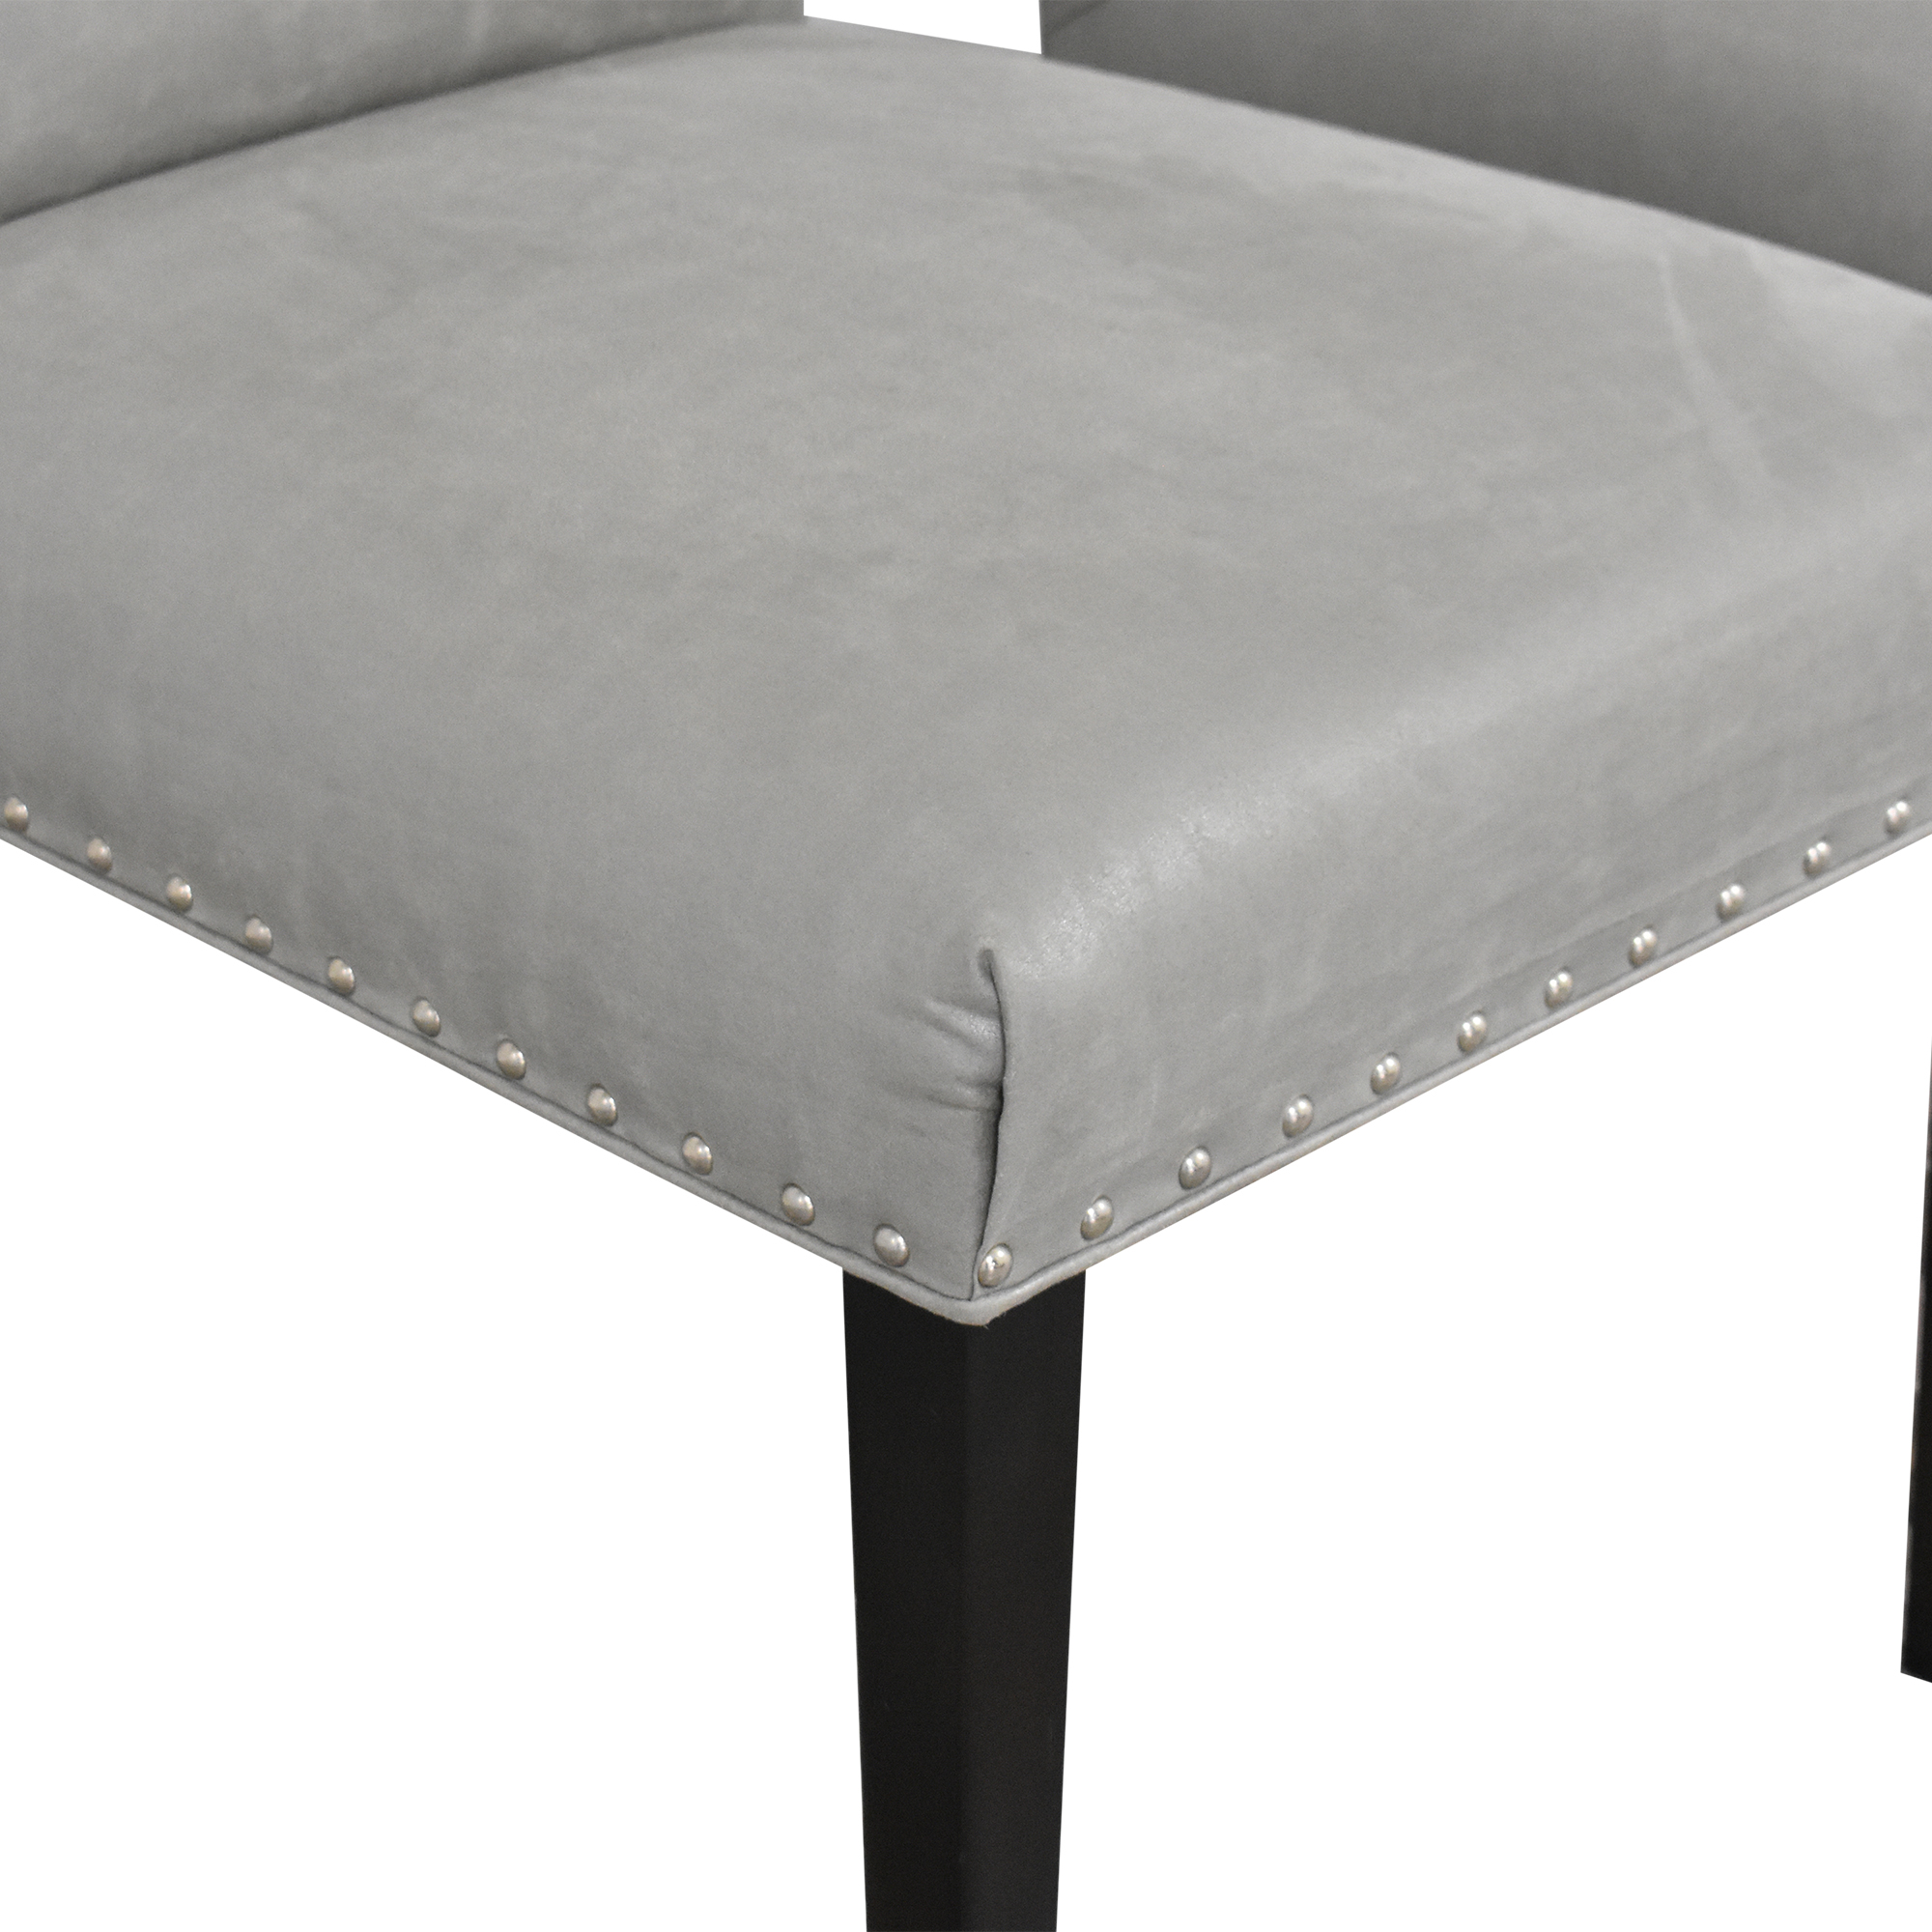 Vanguard Furniture Vanguard Michael Weiss Everhart Side Dining Chairs nj